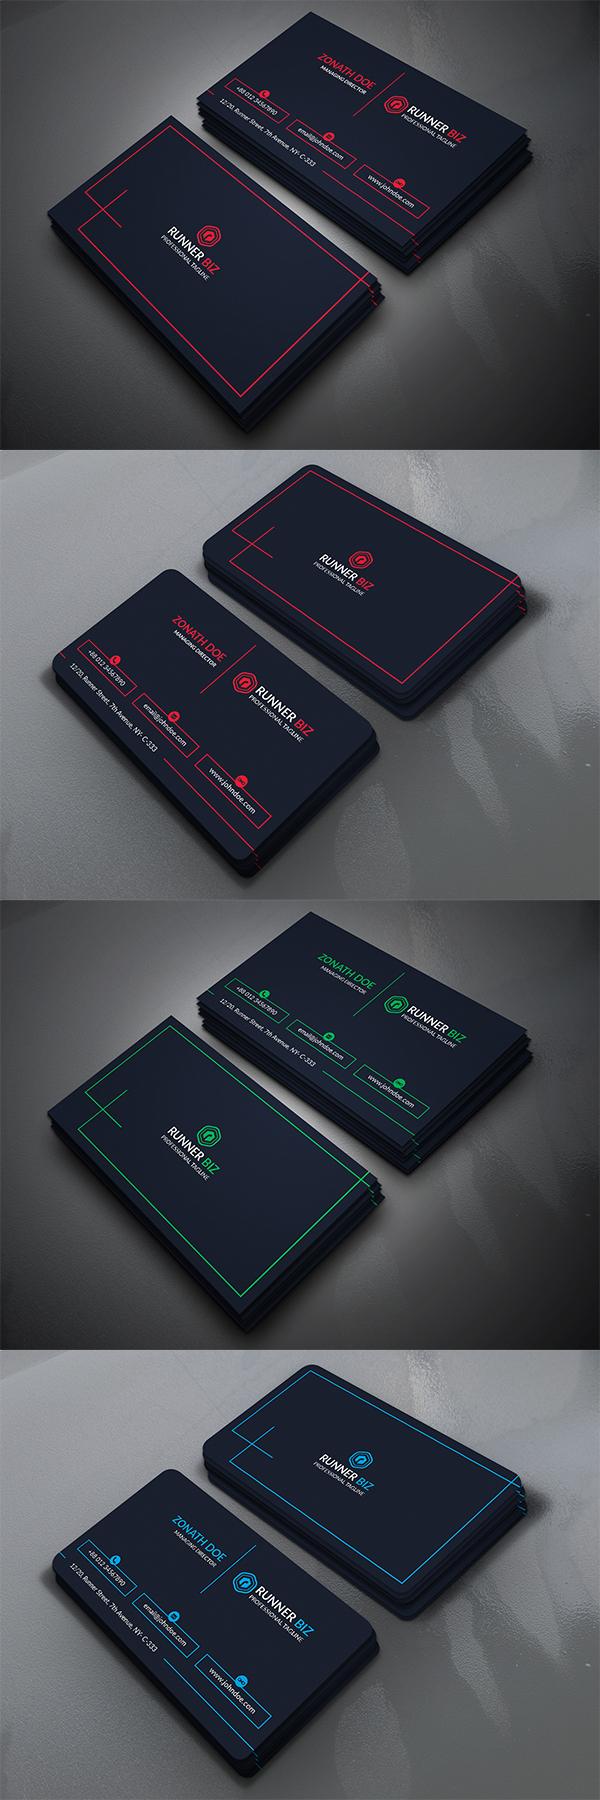 17 Business Card Design